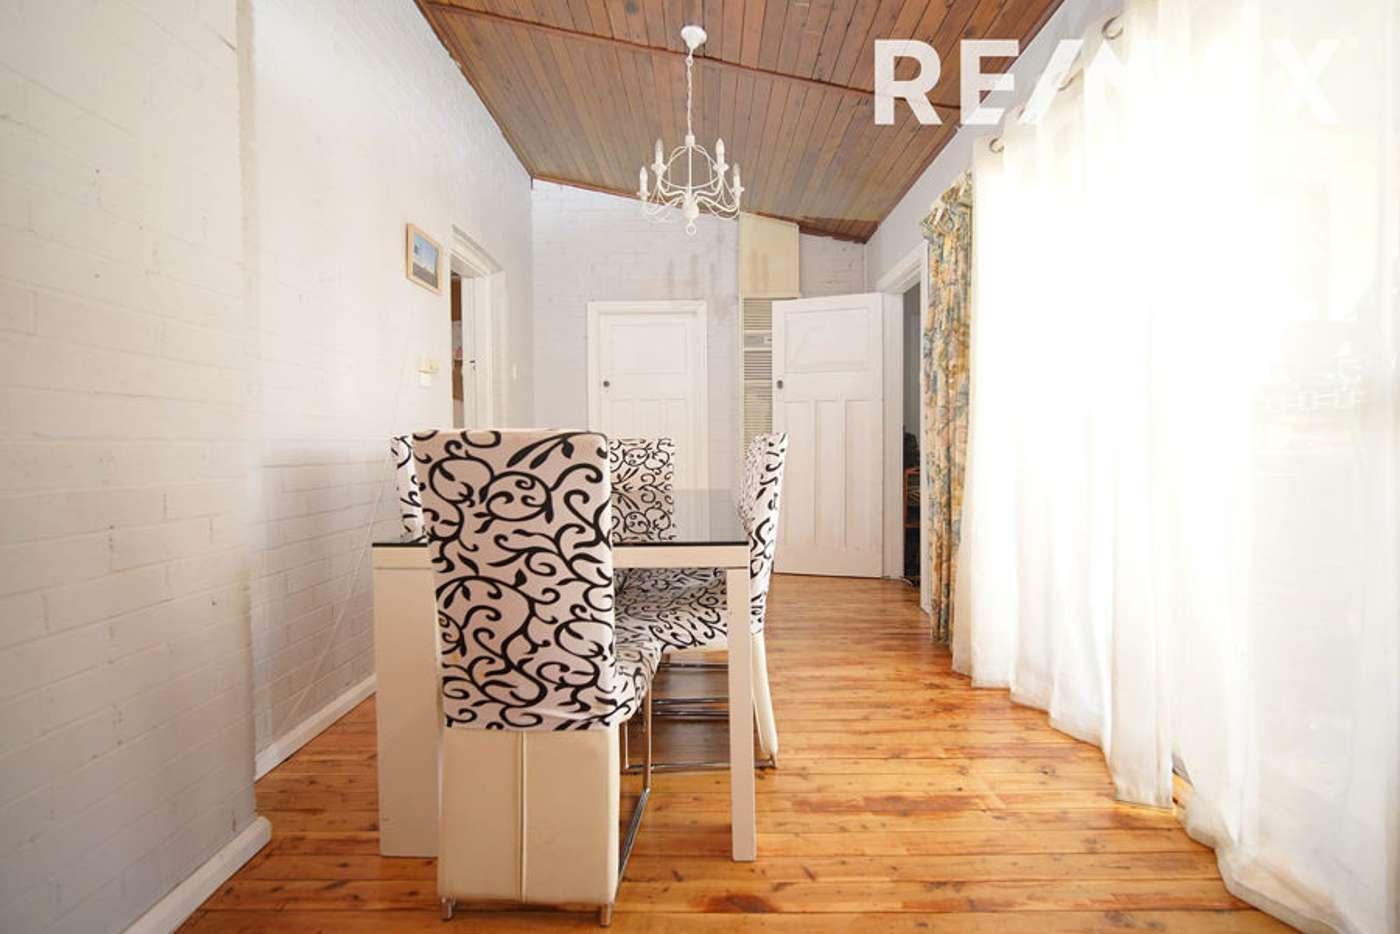 Sixth view of Homely house listing, 75 Docker Street, Wagga Wagga NSW 2650